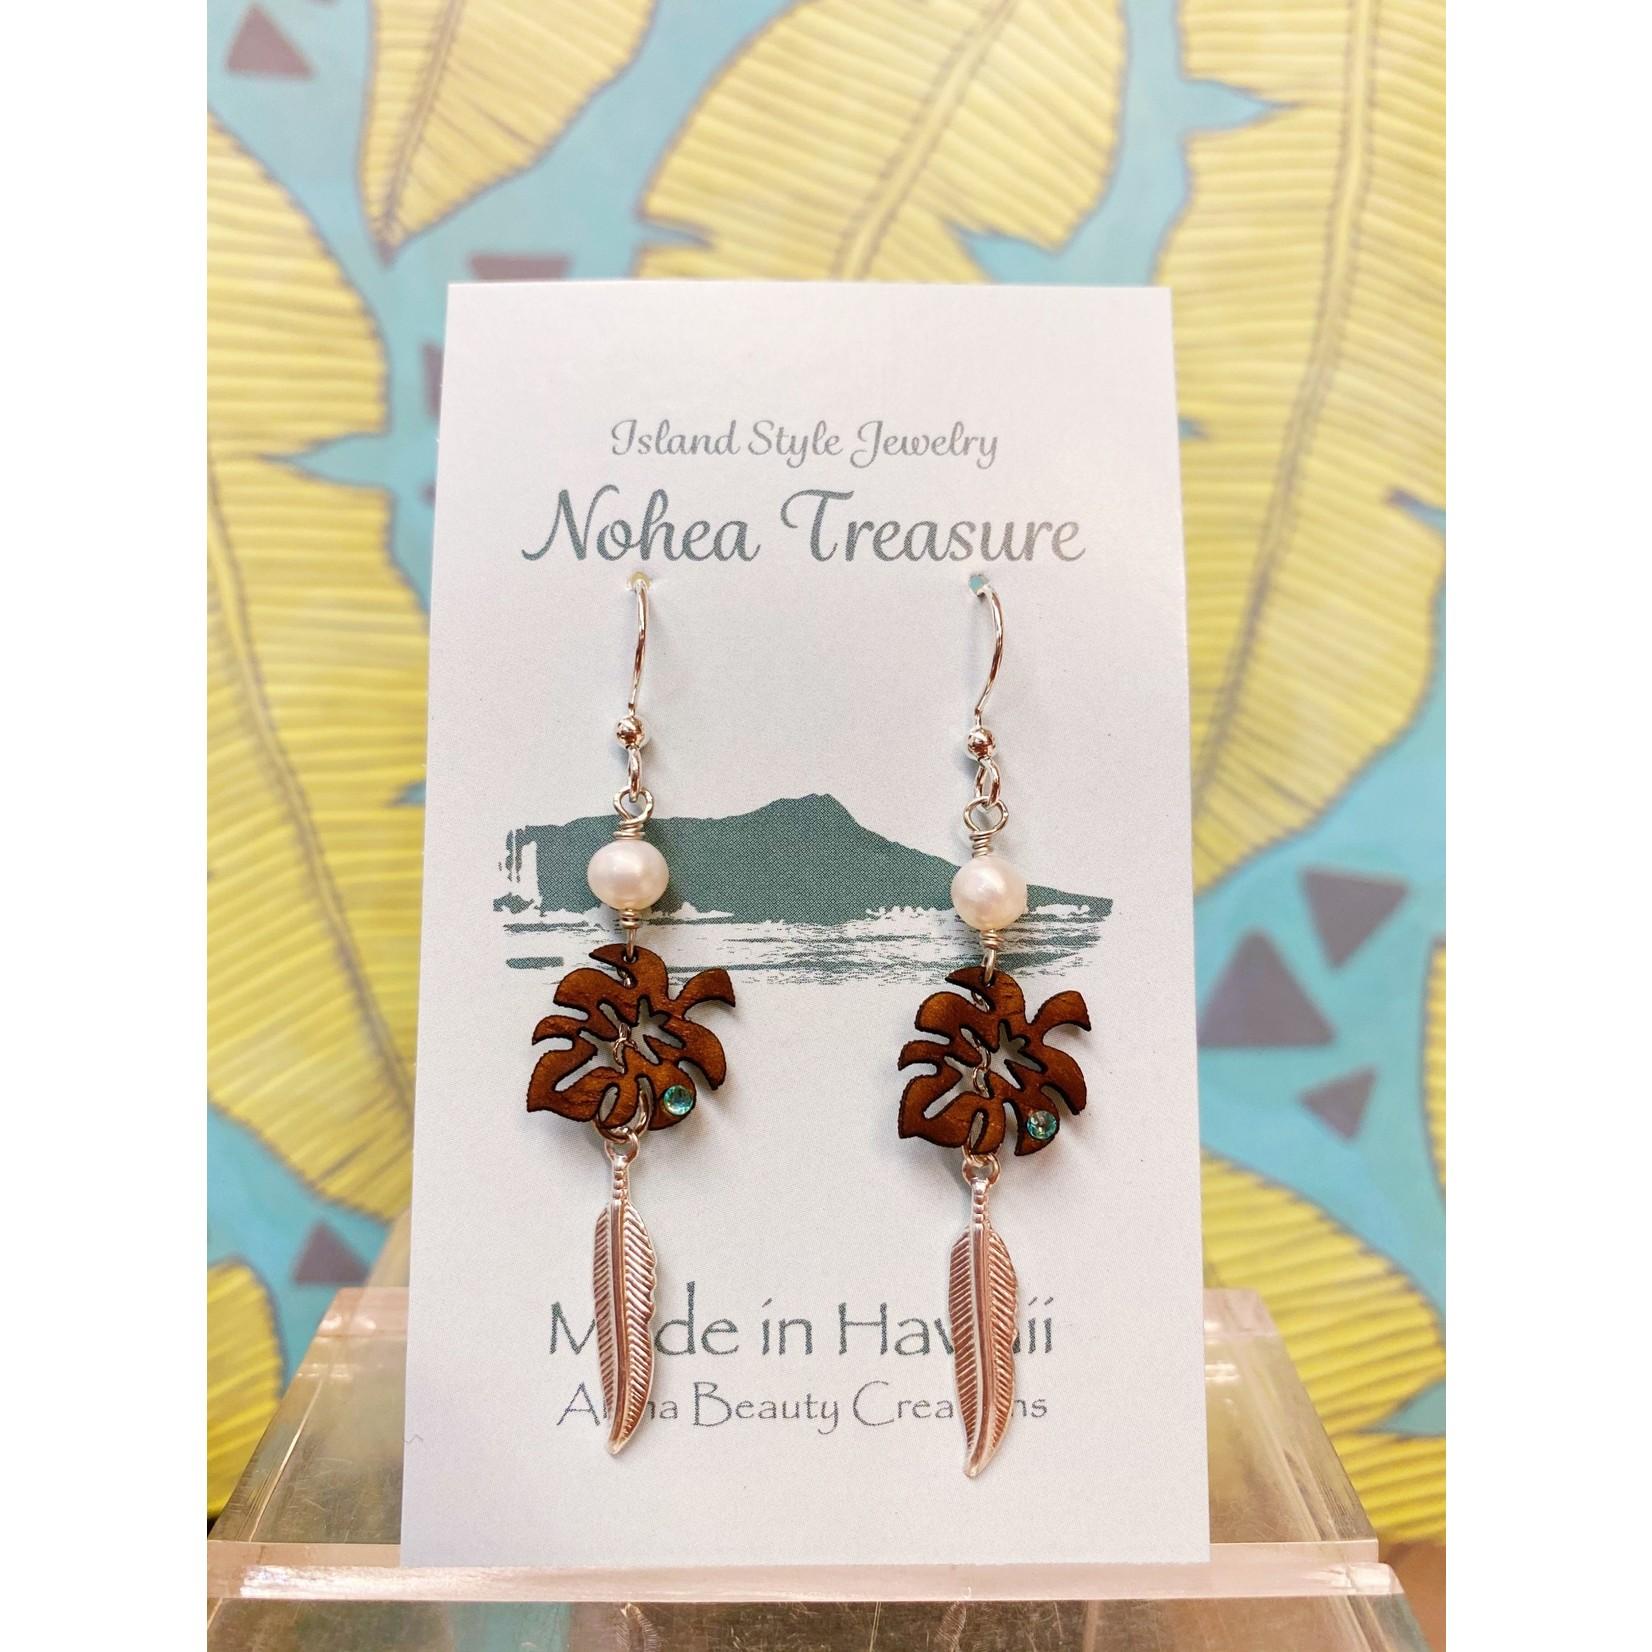 Aloha Beauty Creations Nohea Treasure Accessories Earrings Monstera/Feather